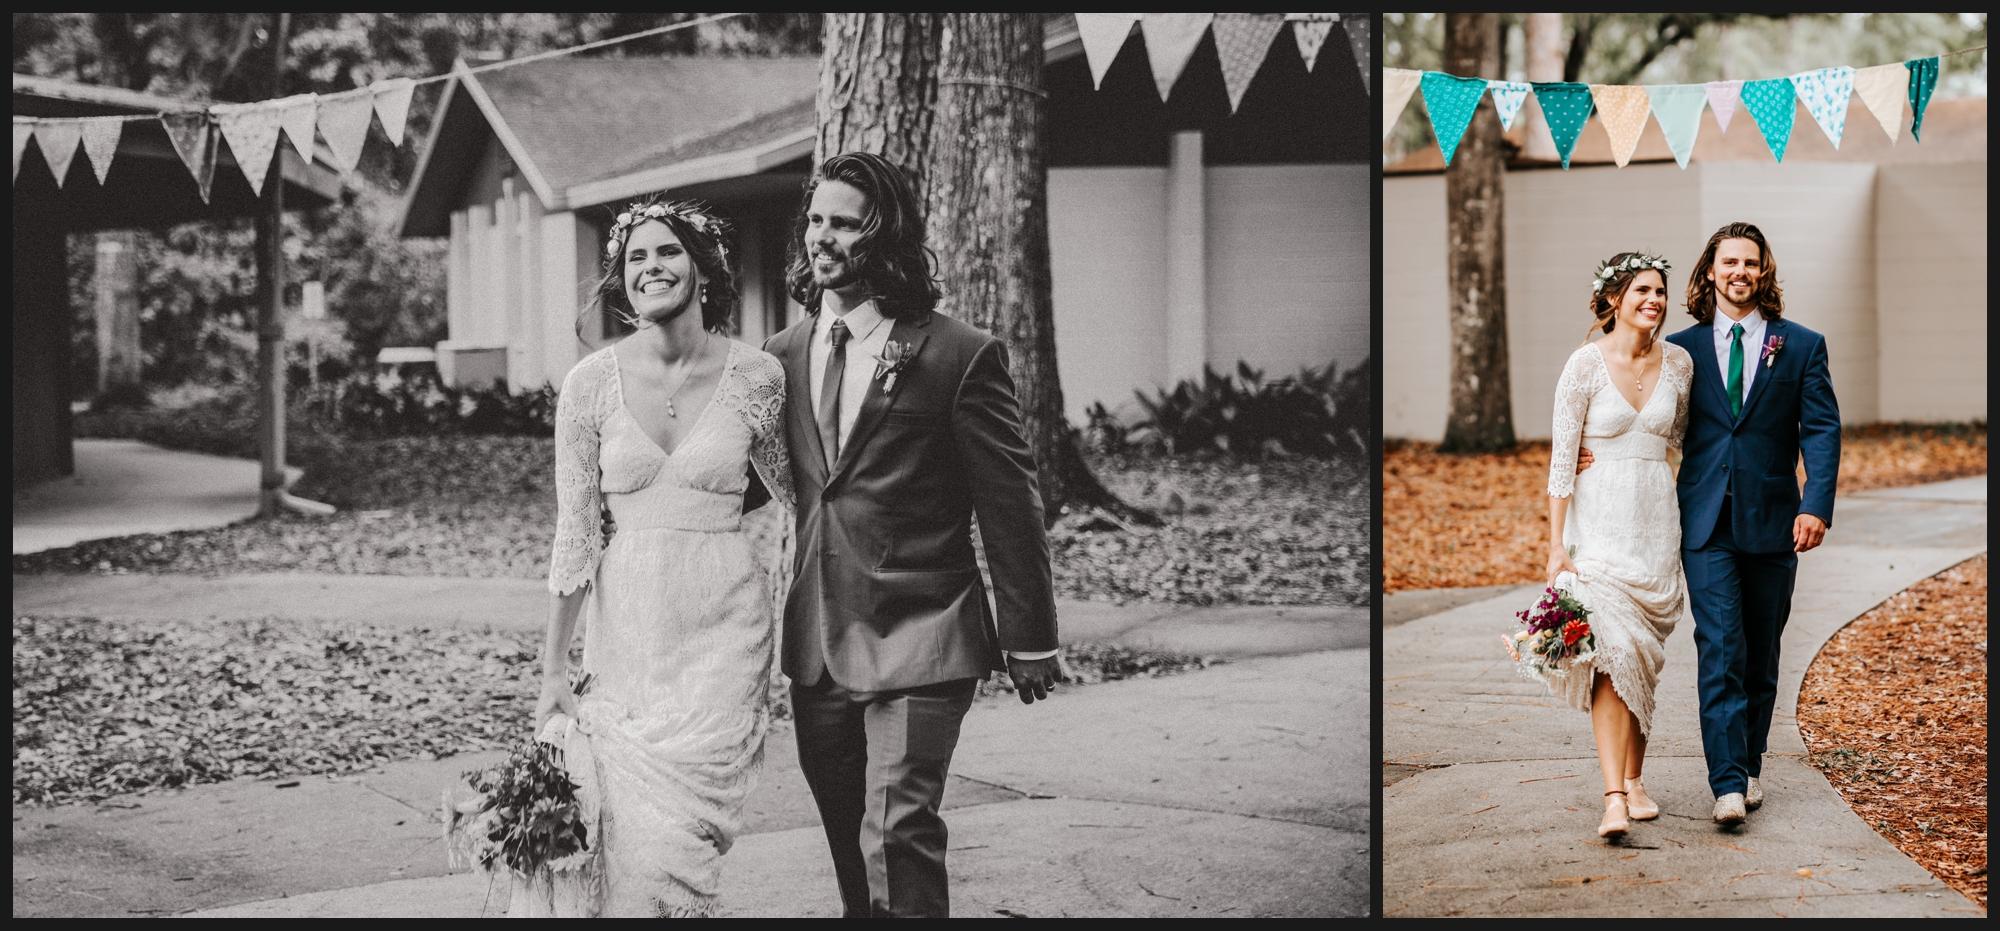 Orlando-Wedding-Photographer_0019.jpg